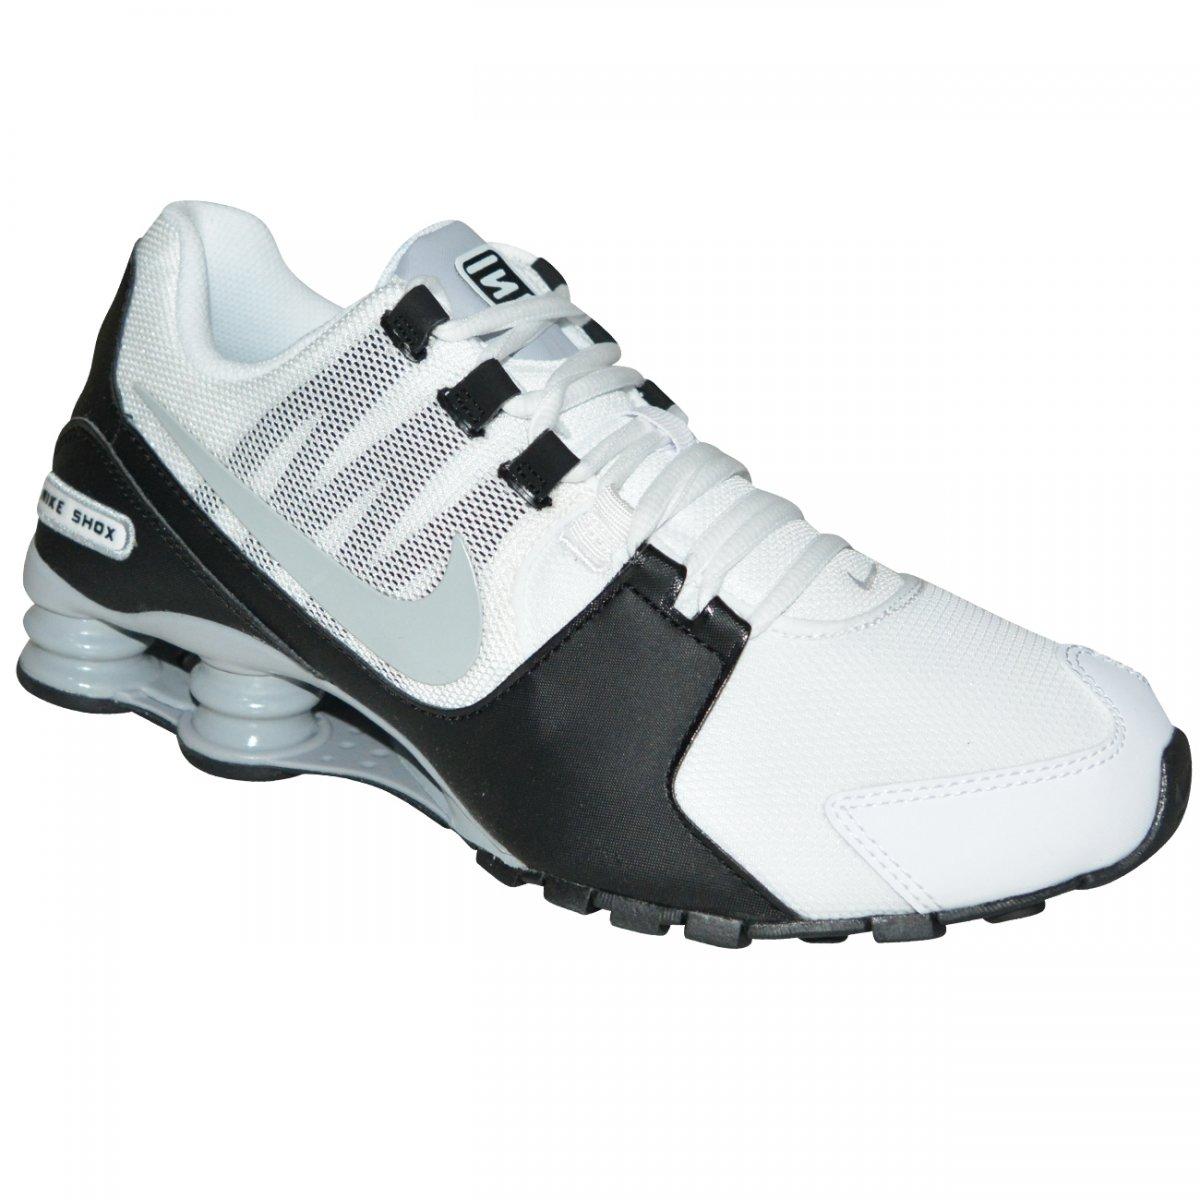 2a20861be43 Tenis Nike Shox Avenue 833583 100 - Branco preto cinza - Chuteira Nike